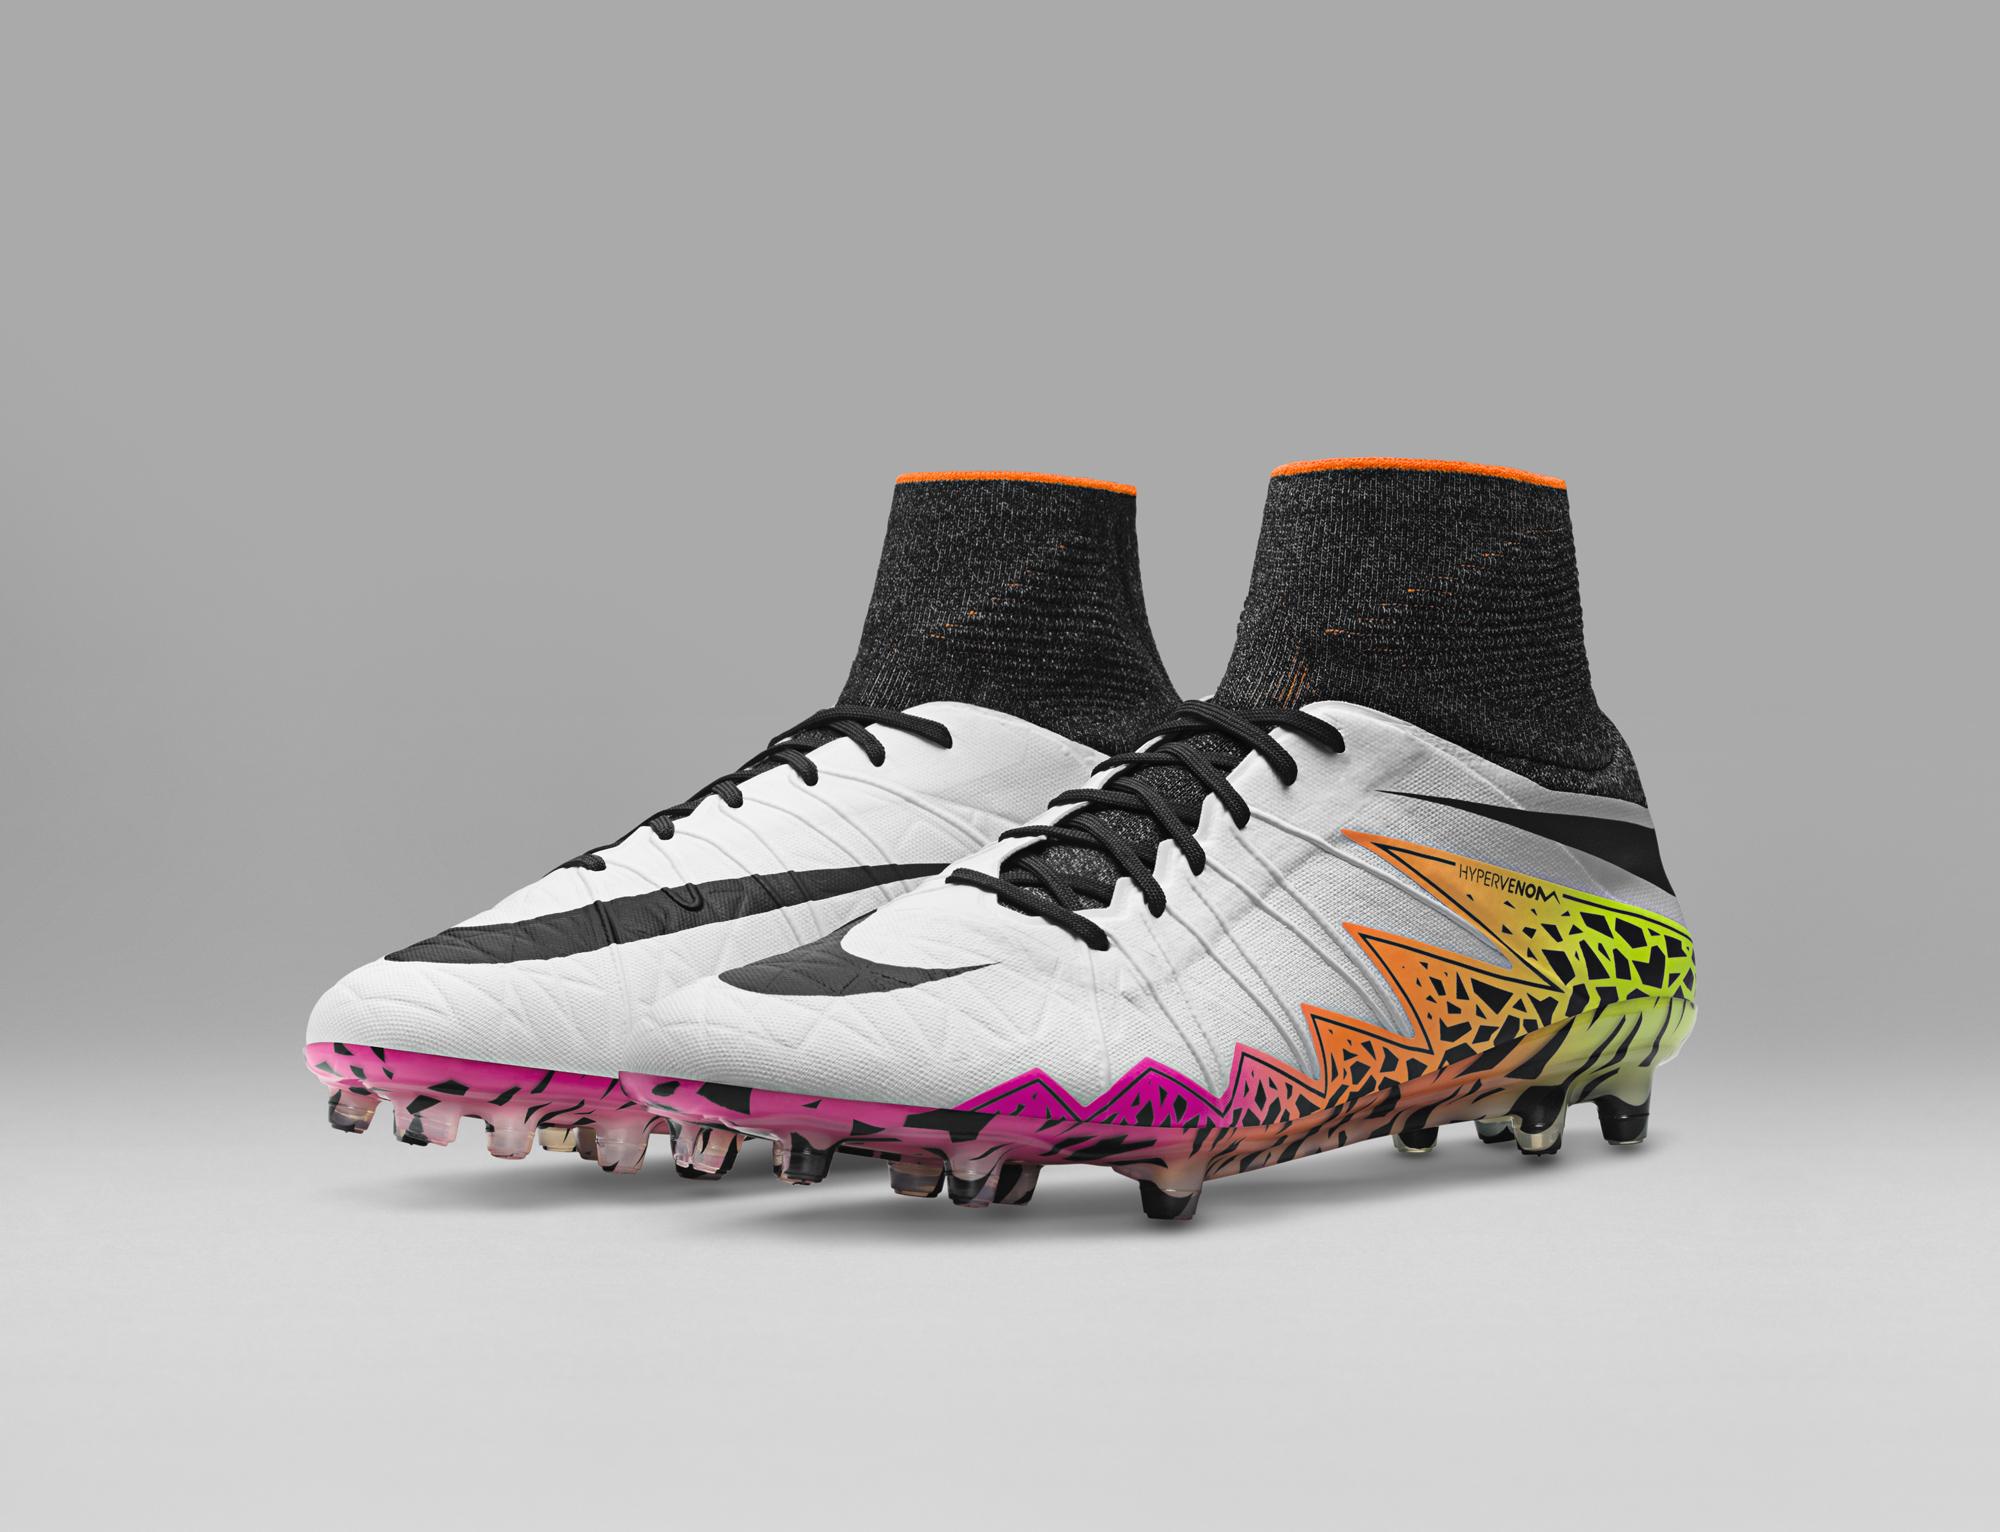 Alte Nike Da Scarpe Alte Alte Calcio Nike Scarpe Scarpe Da Calcio Nike KJFcl1